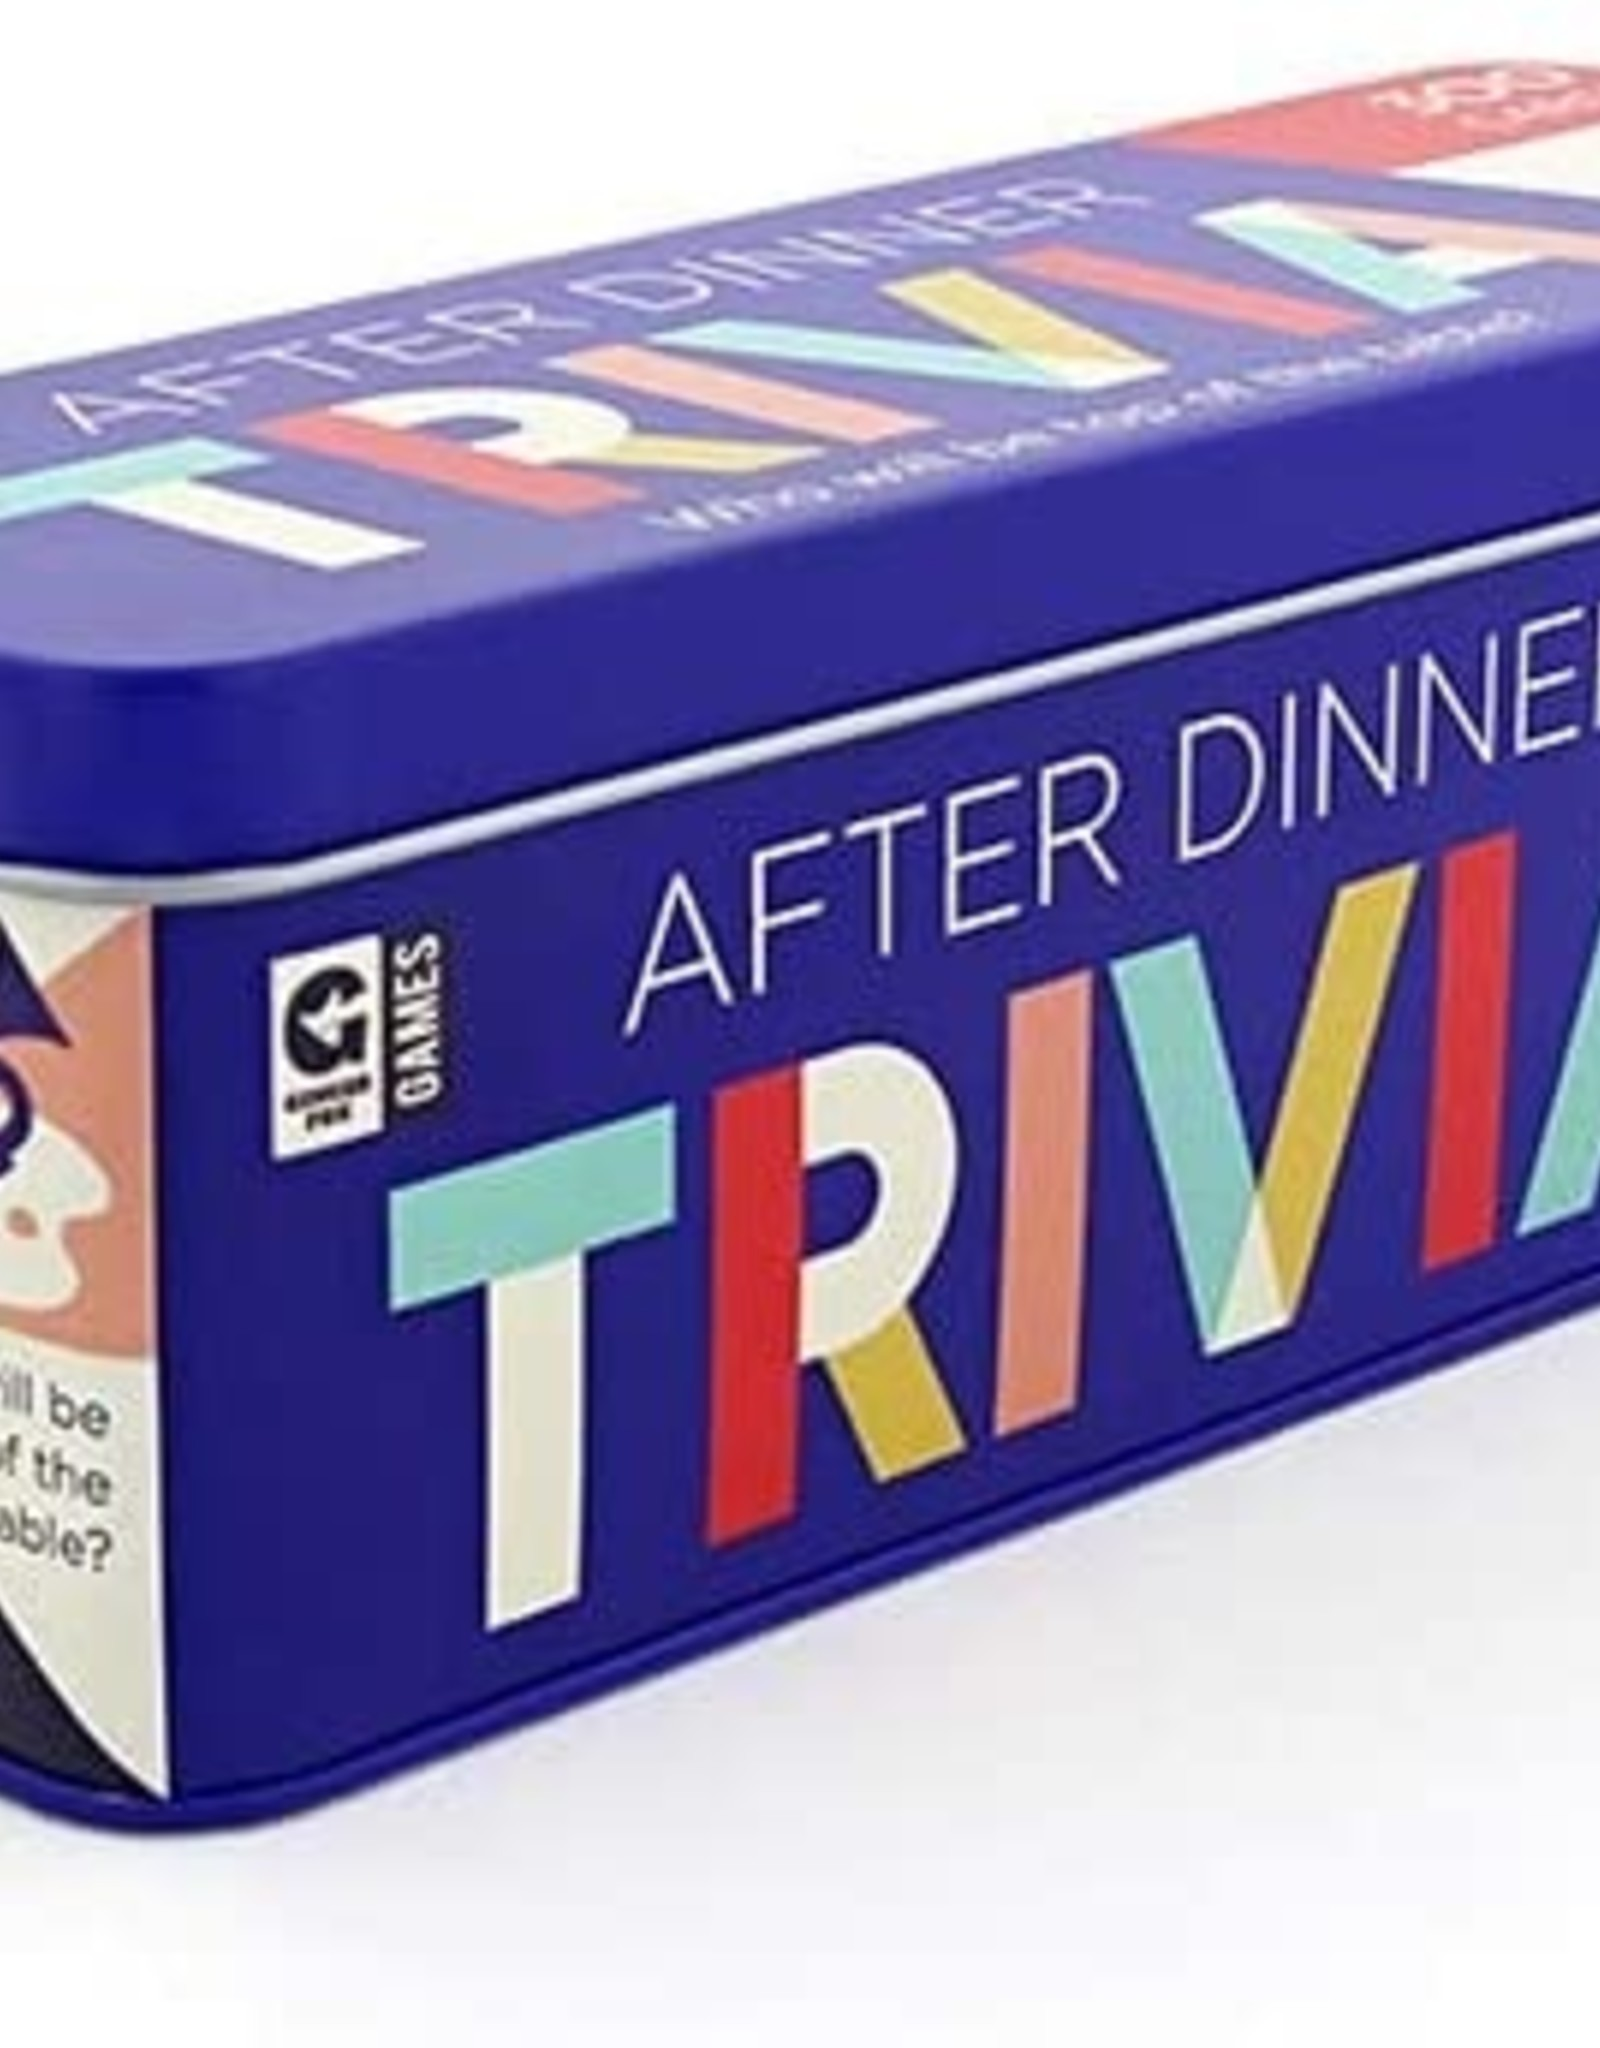 Ginger Fox Ginger Fox - After Dinner Trivia